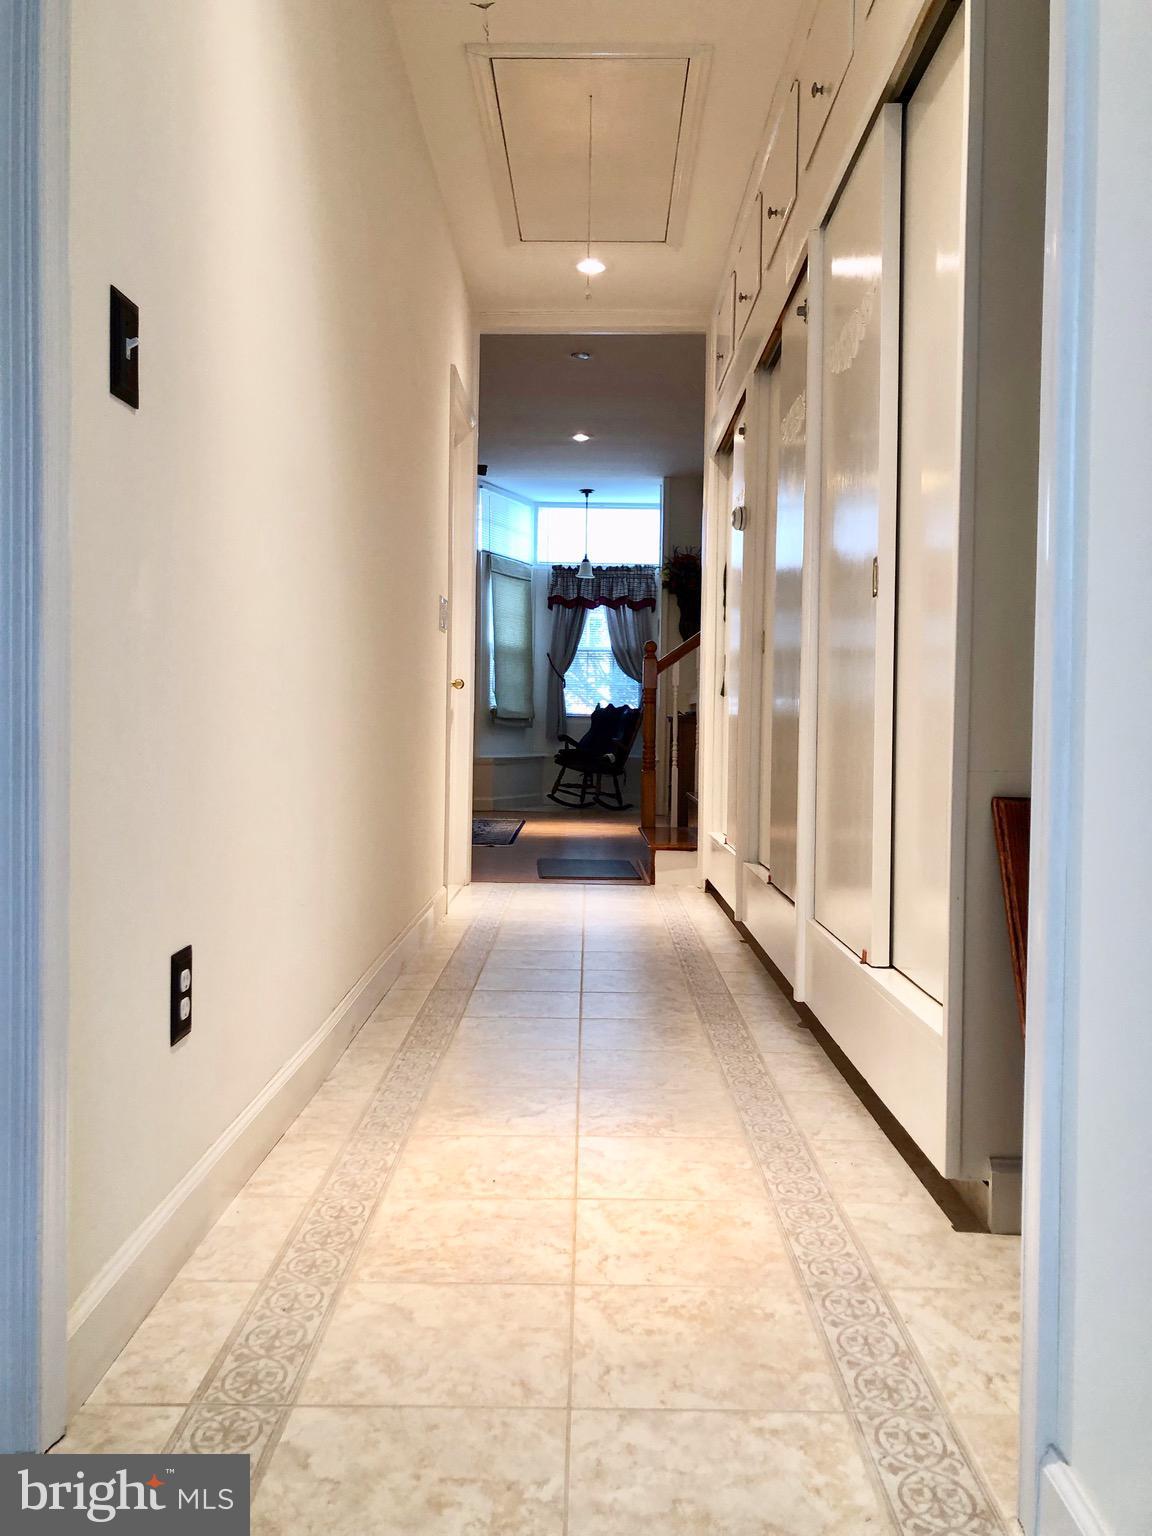 ILS Hallway